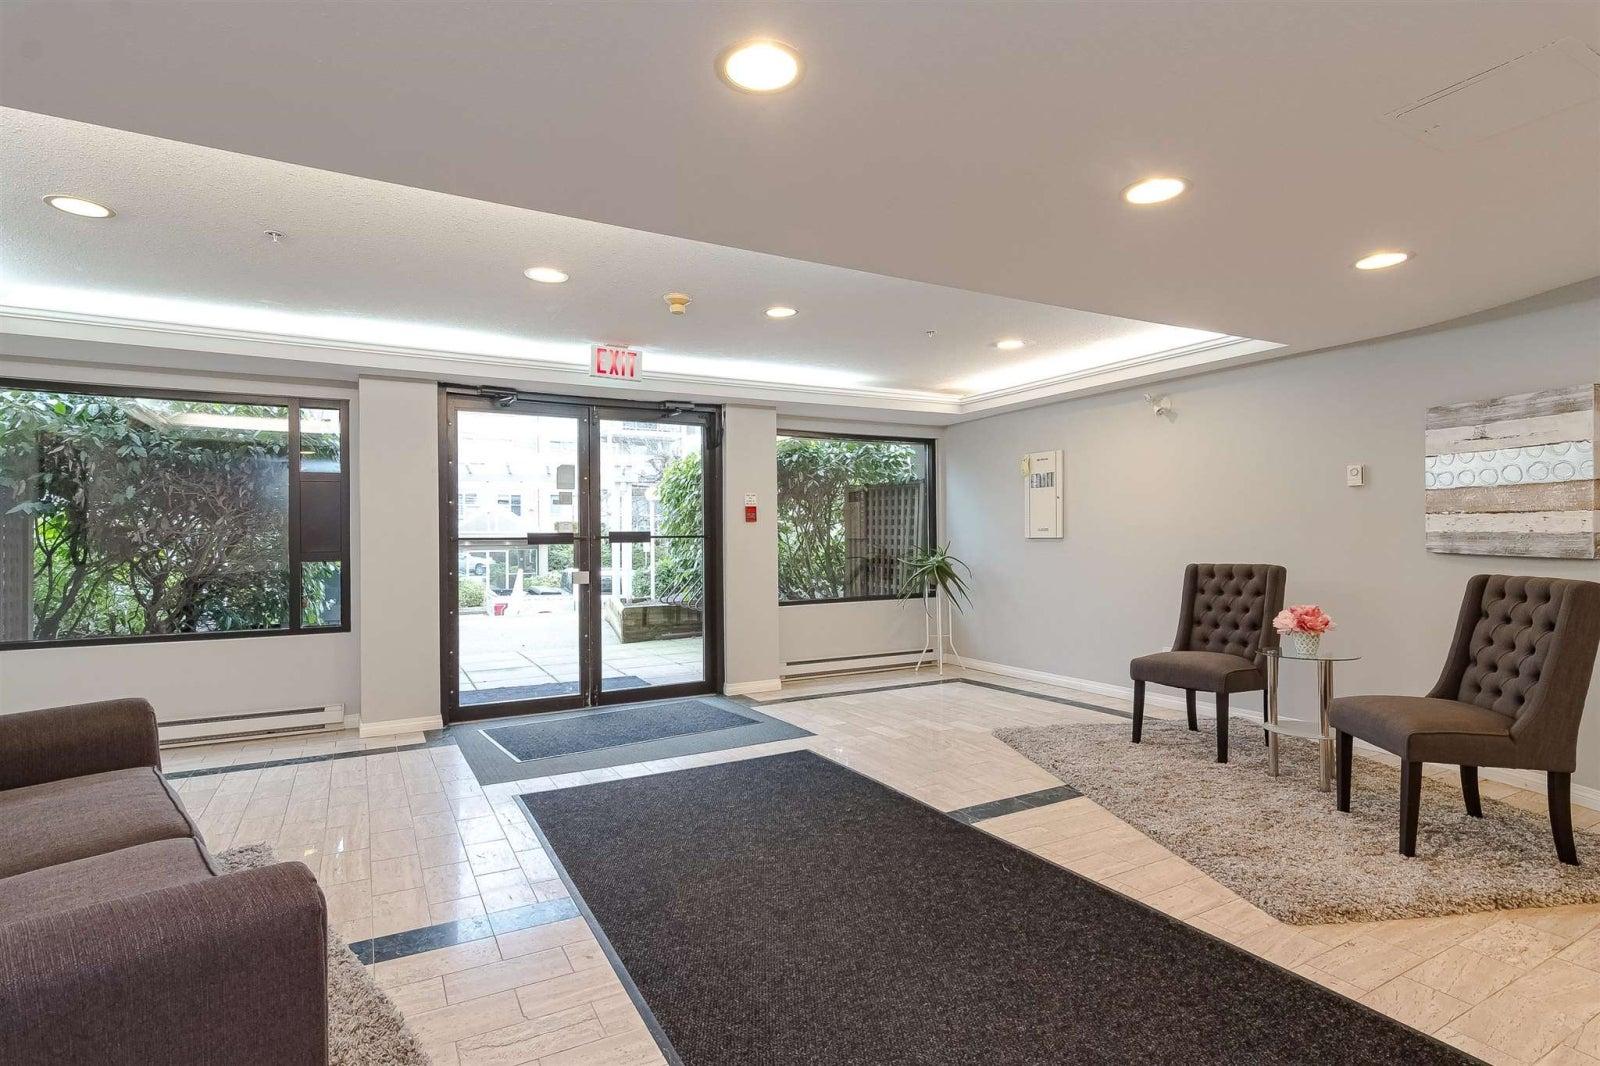 405 20268 54 AVENUE - Langley City Apartment/Condo for sale, 2 Bedrooms (R2604183) #2